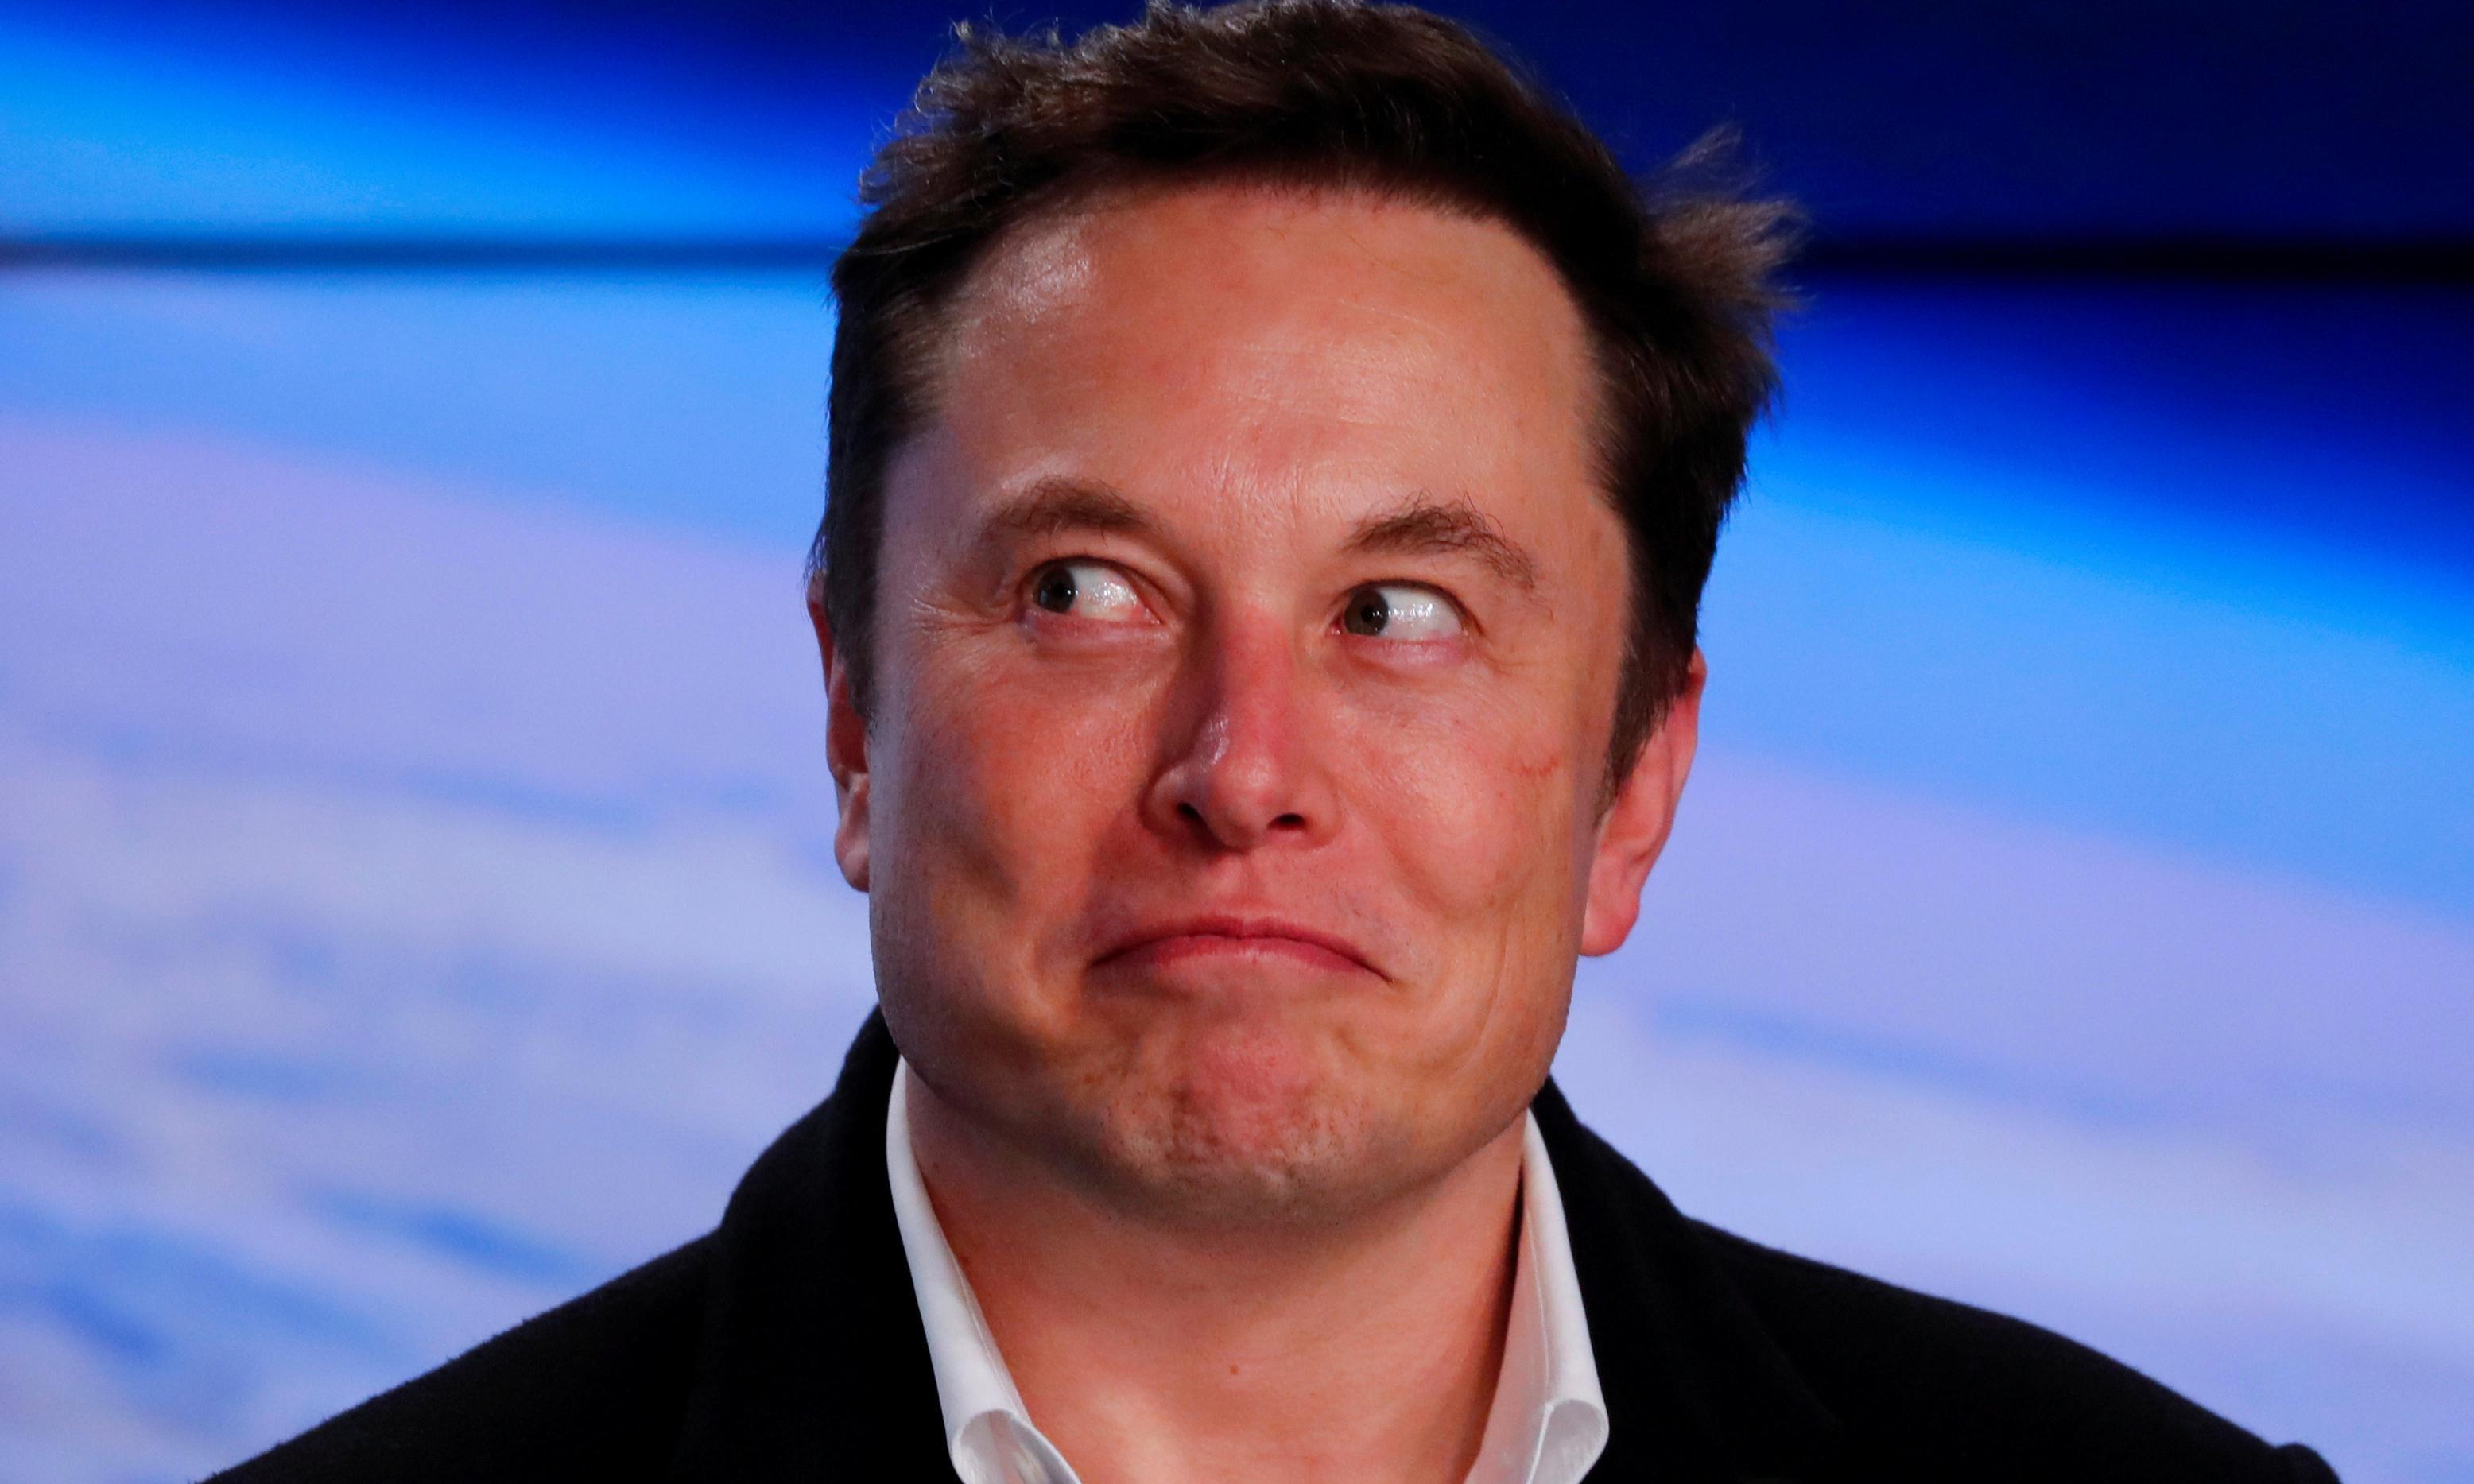 Elon Musk hires man behind 'absolute unit' sheep meme to run Tesla's social media